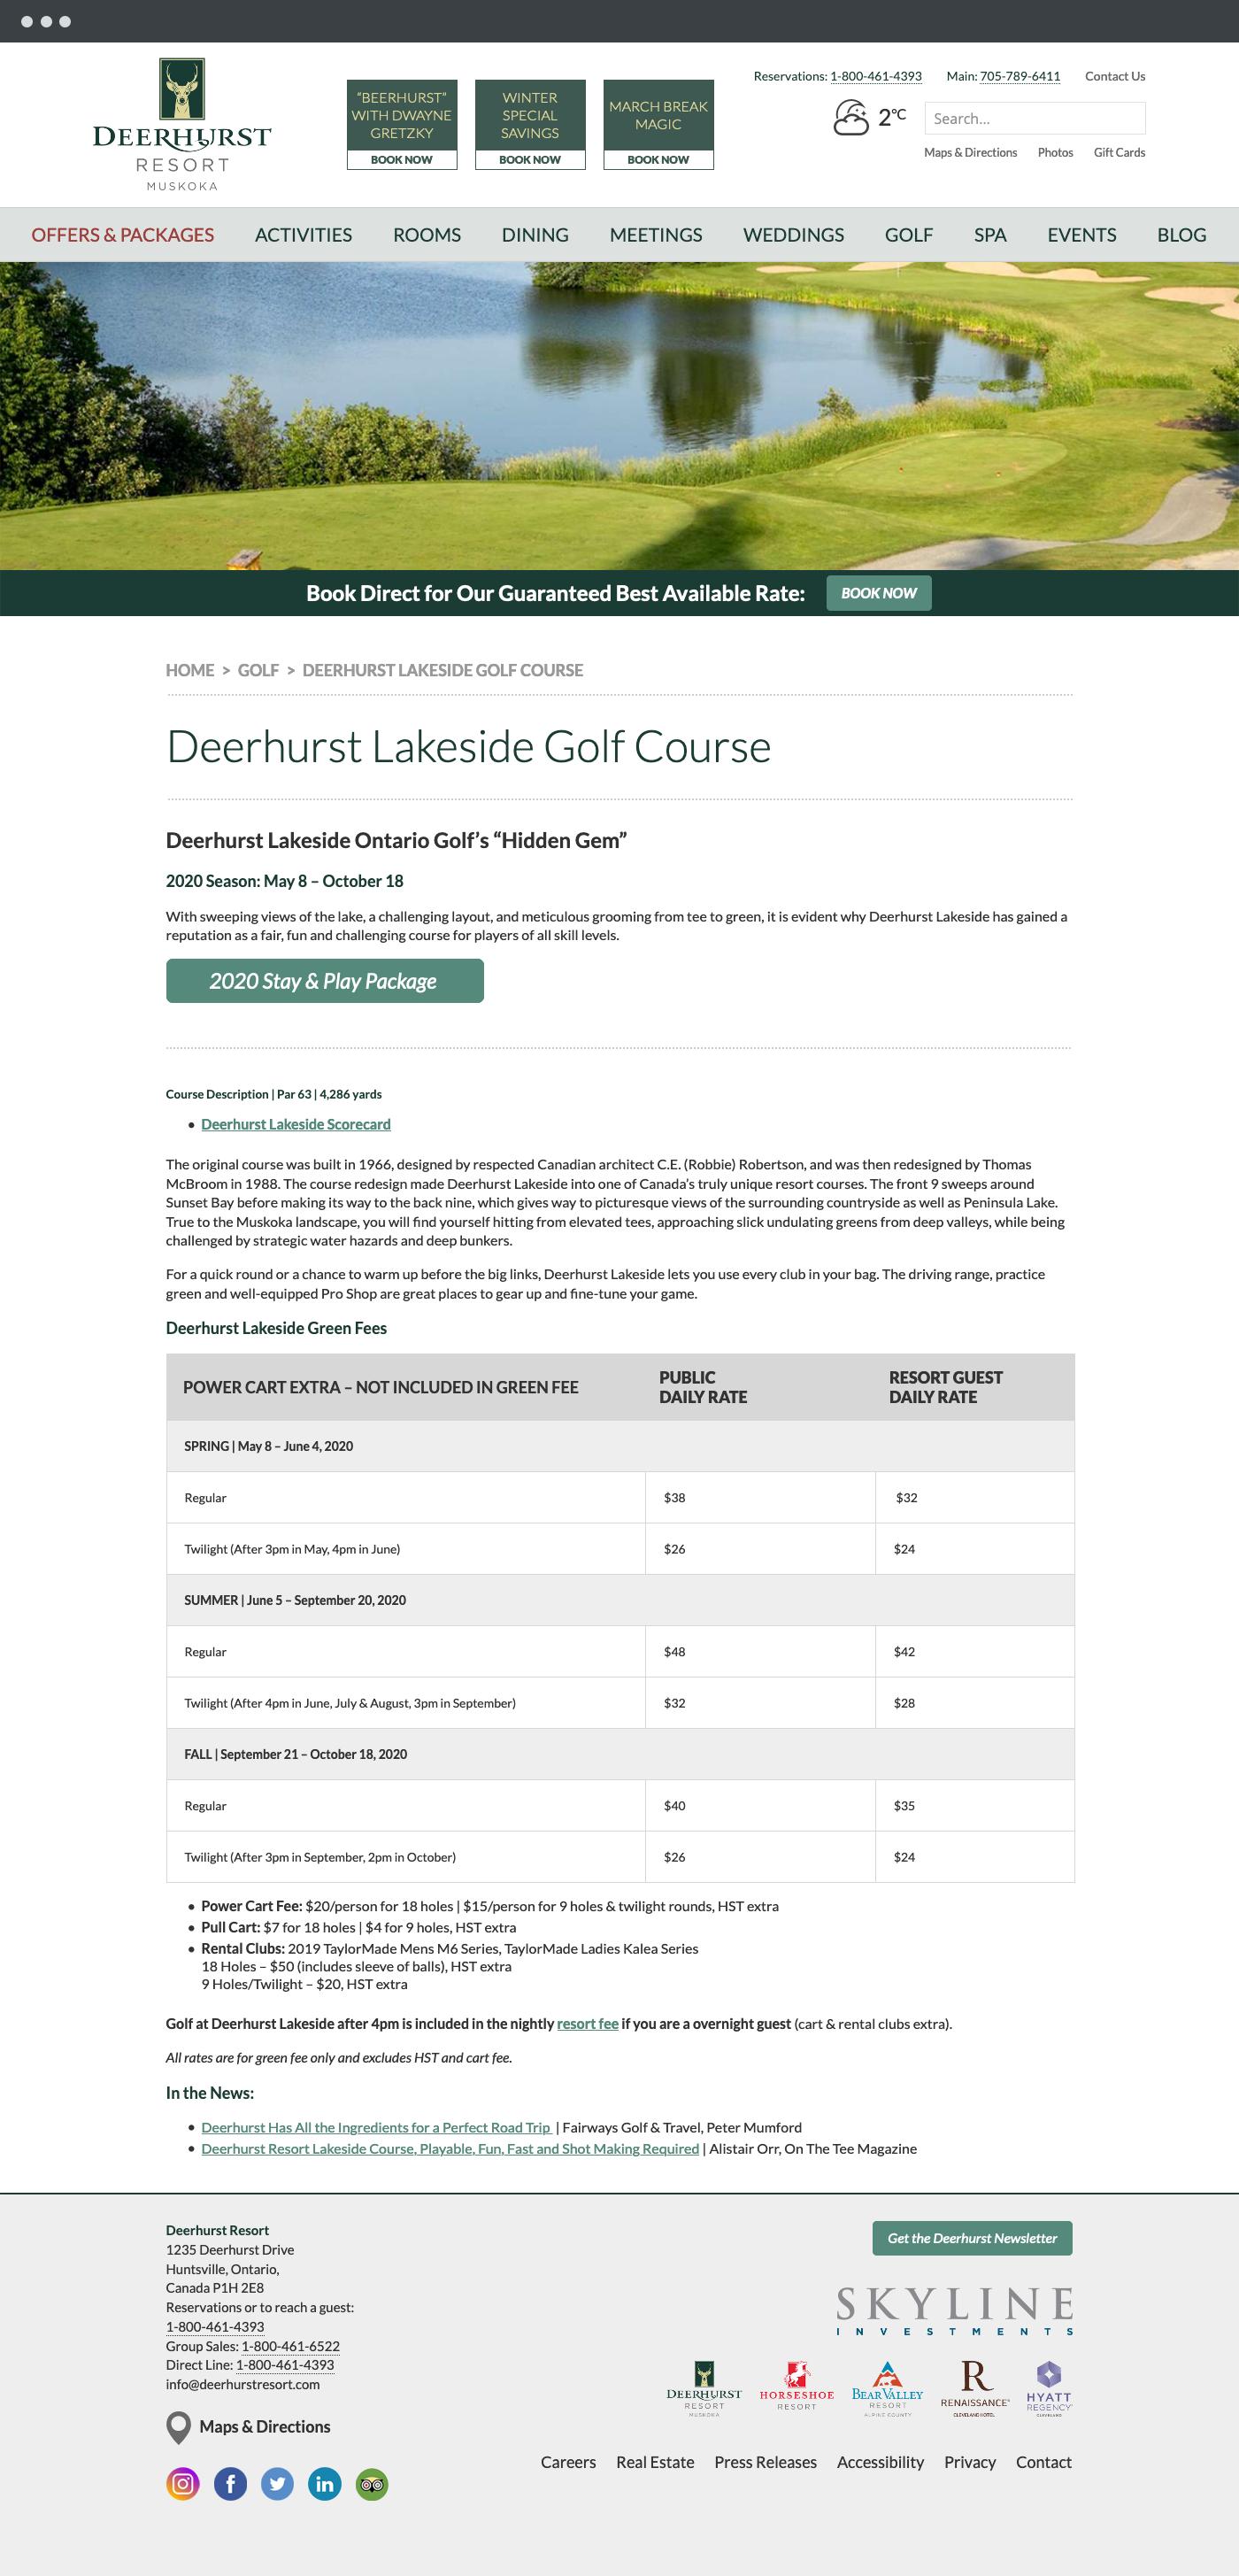 Deerhurst Resort golf page